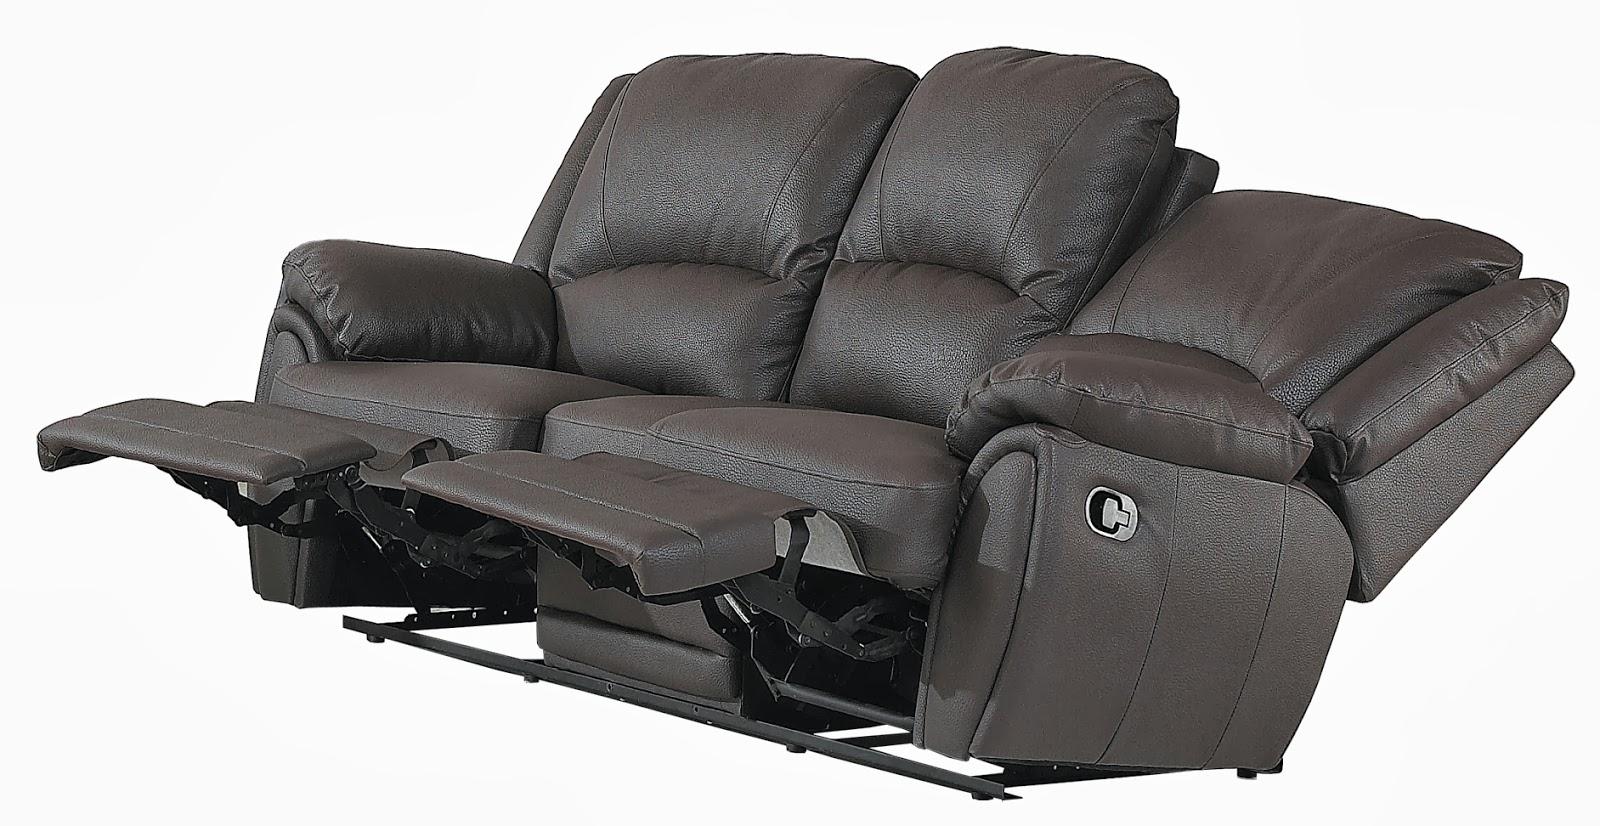 Muebles Guadalhorce Sillones Relax Caracter Sticas